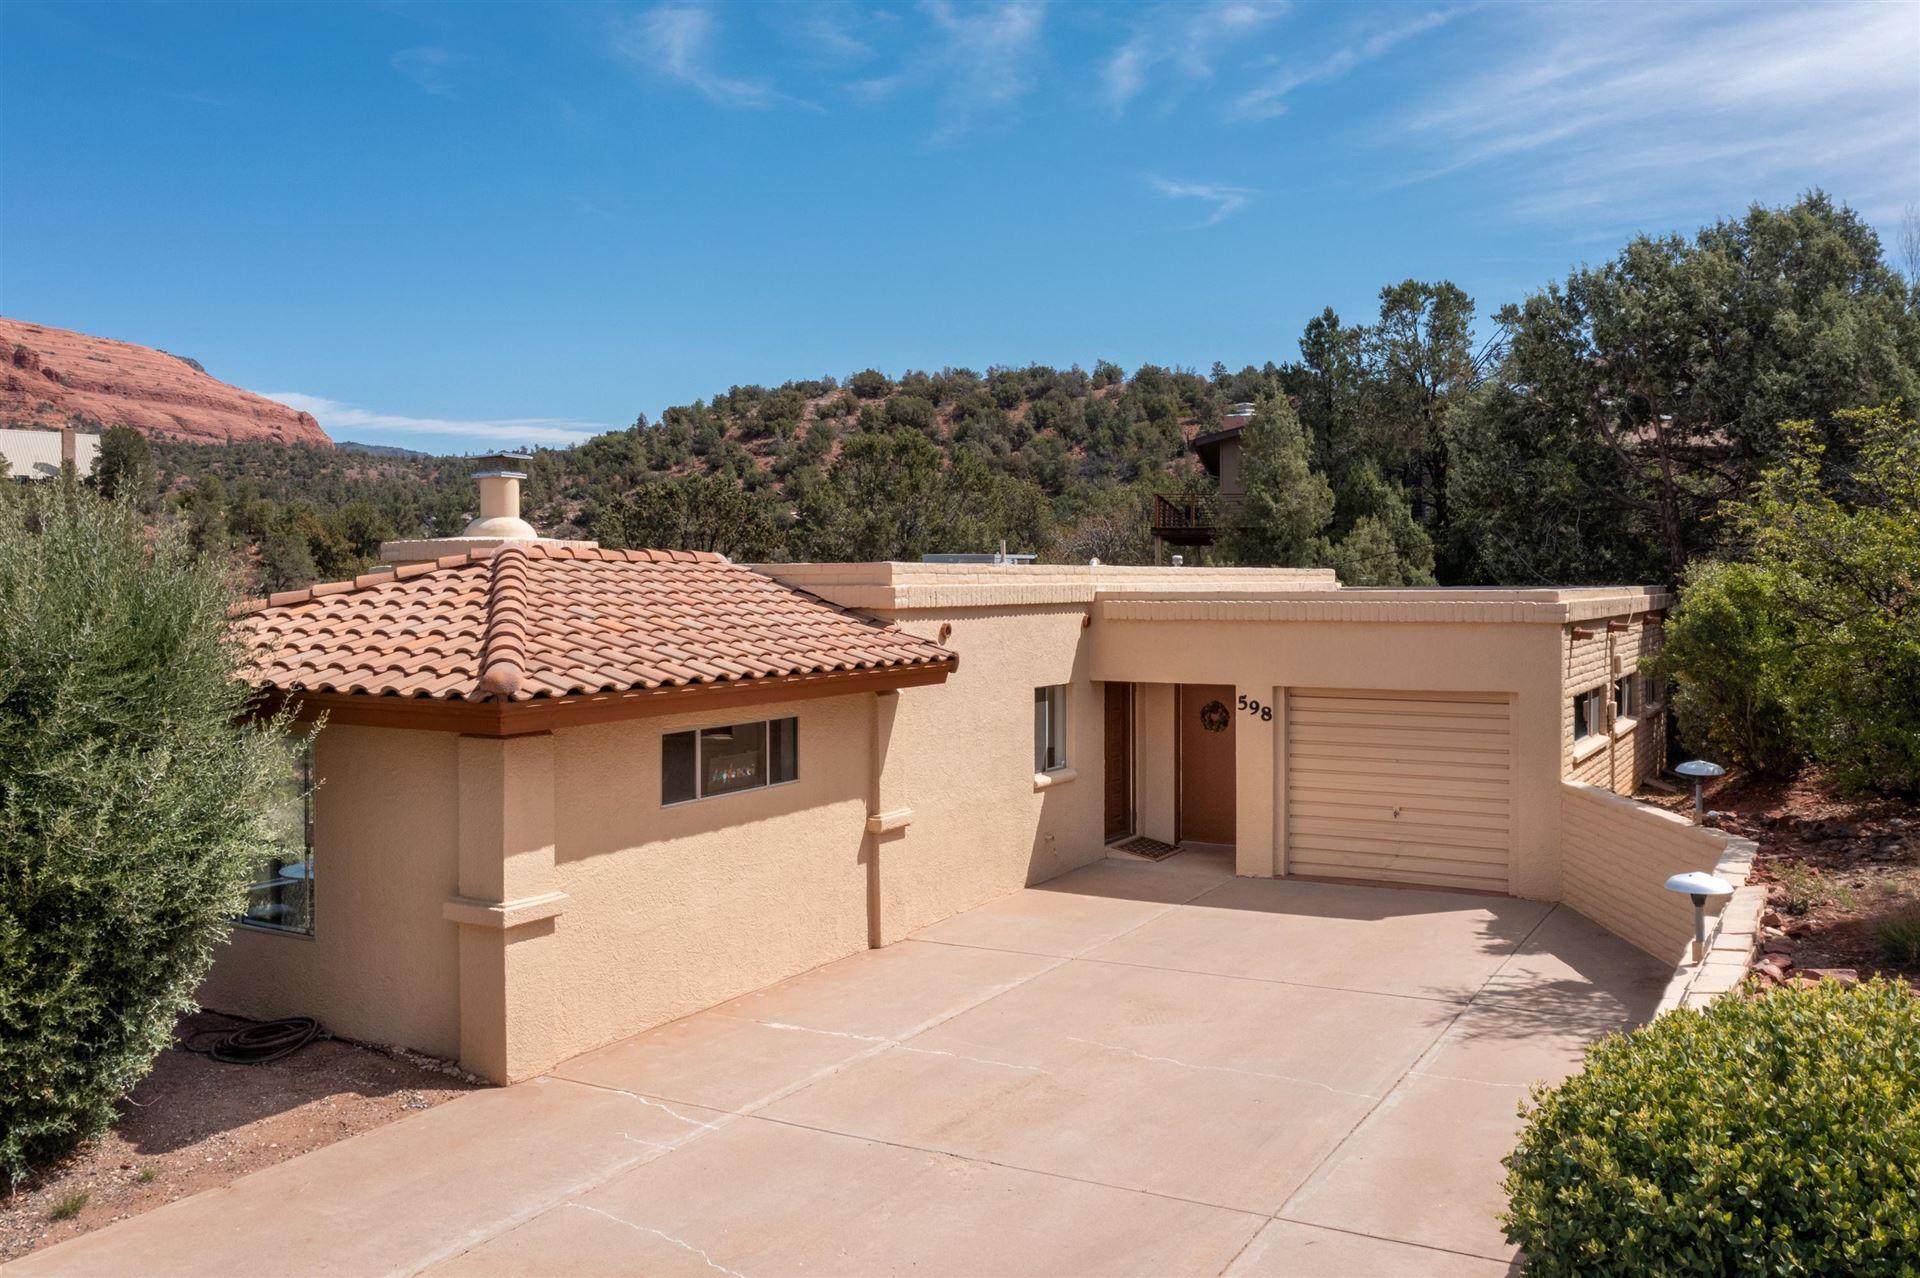 Photo of 598 Circle Drive, Sedona, AZ 86336 (MLS # 526053)